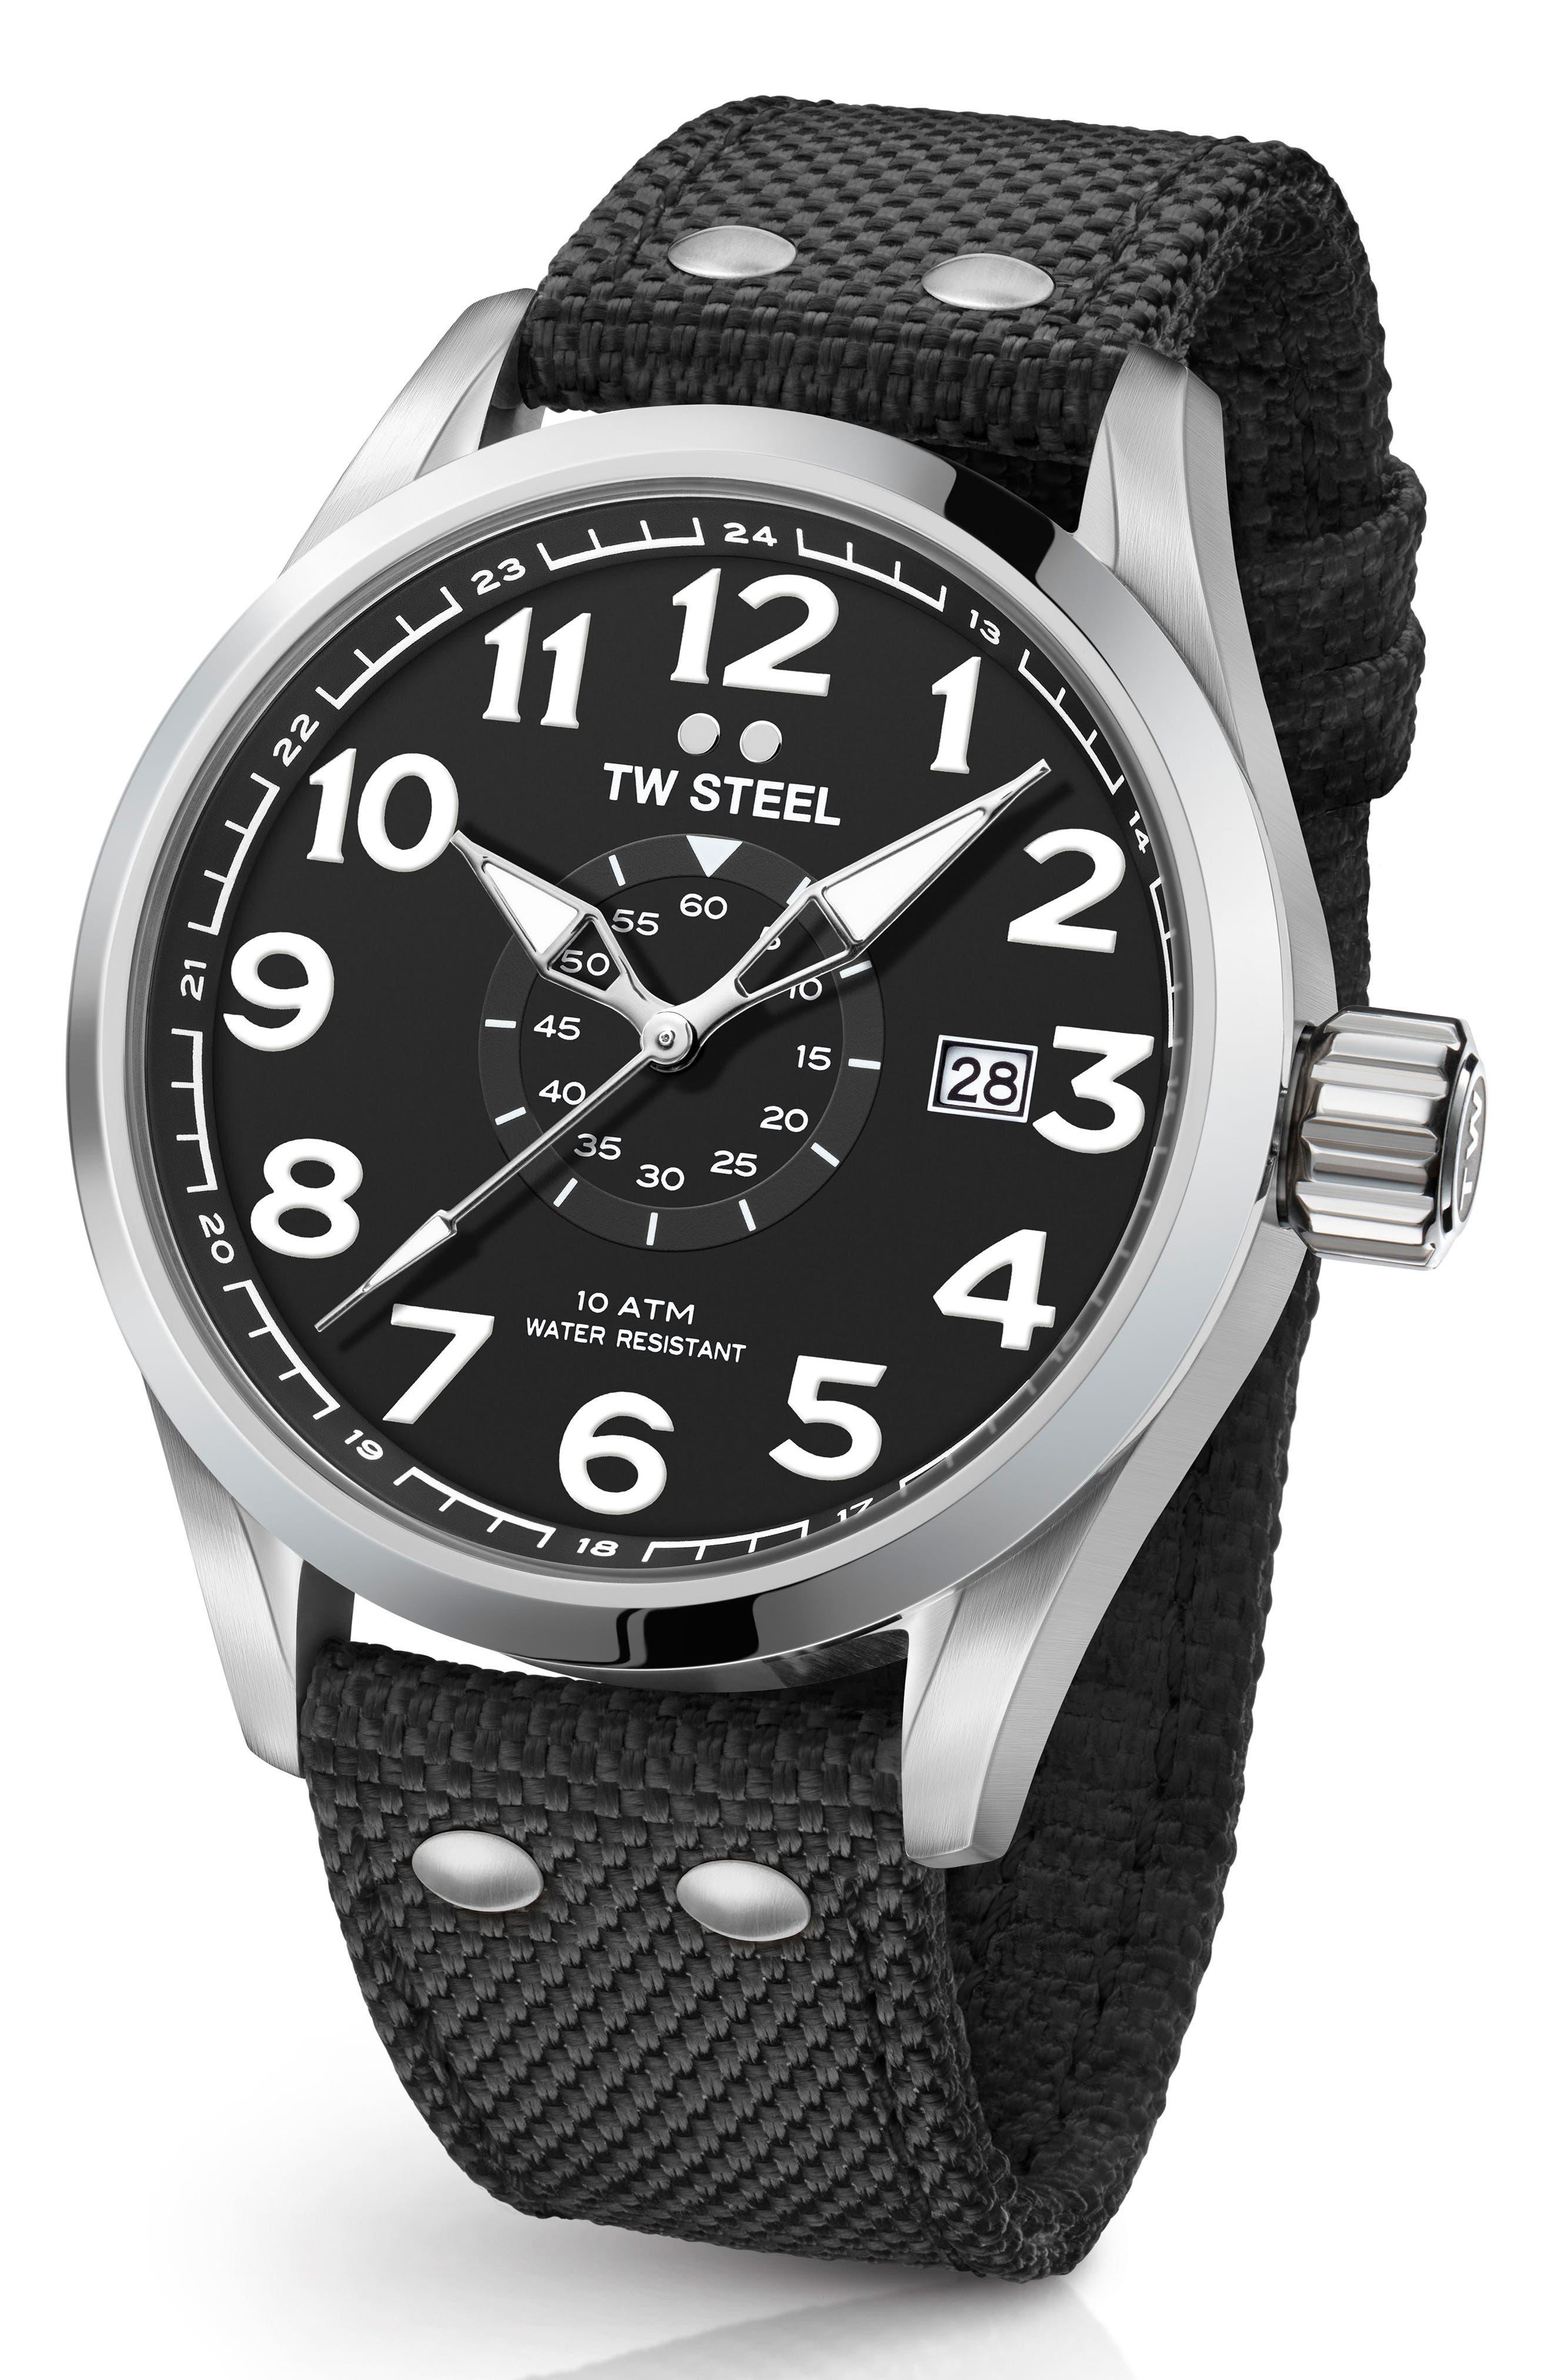 TW STEEL Volante Textile Strap Watch, 45Mm in Black/ Silver